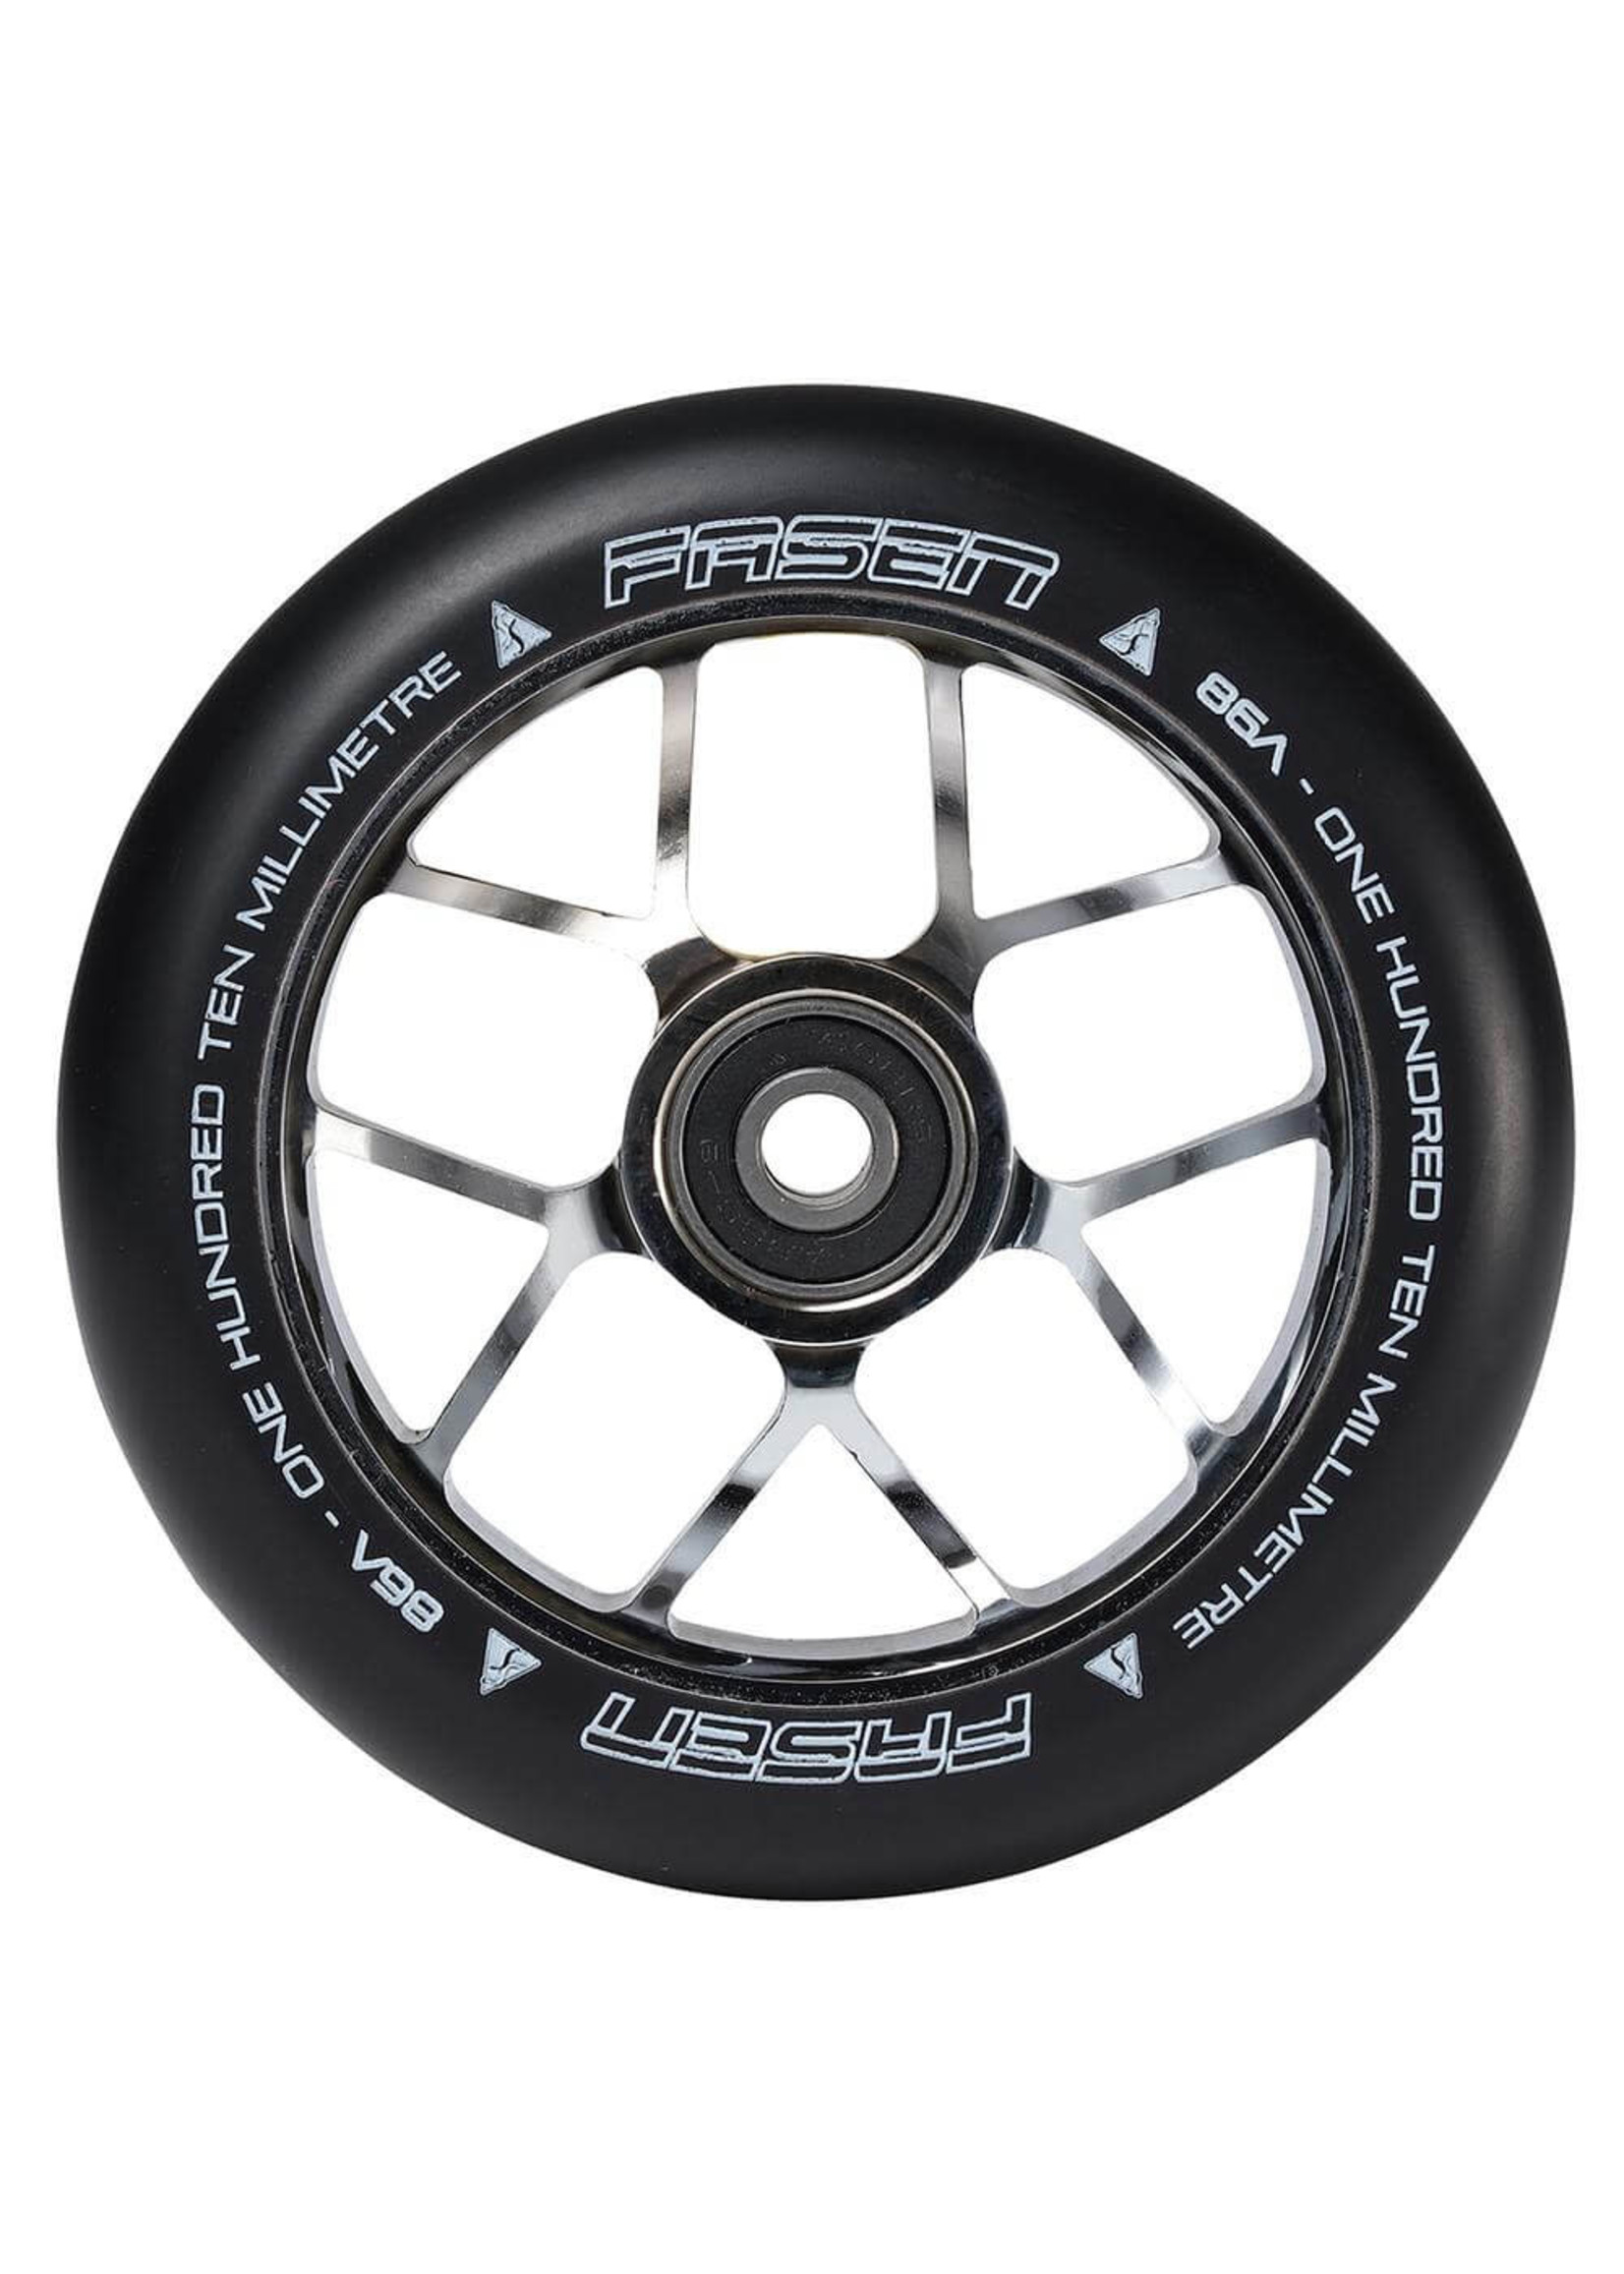 Fasen Fasen - Jet Wheels - 110mm